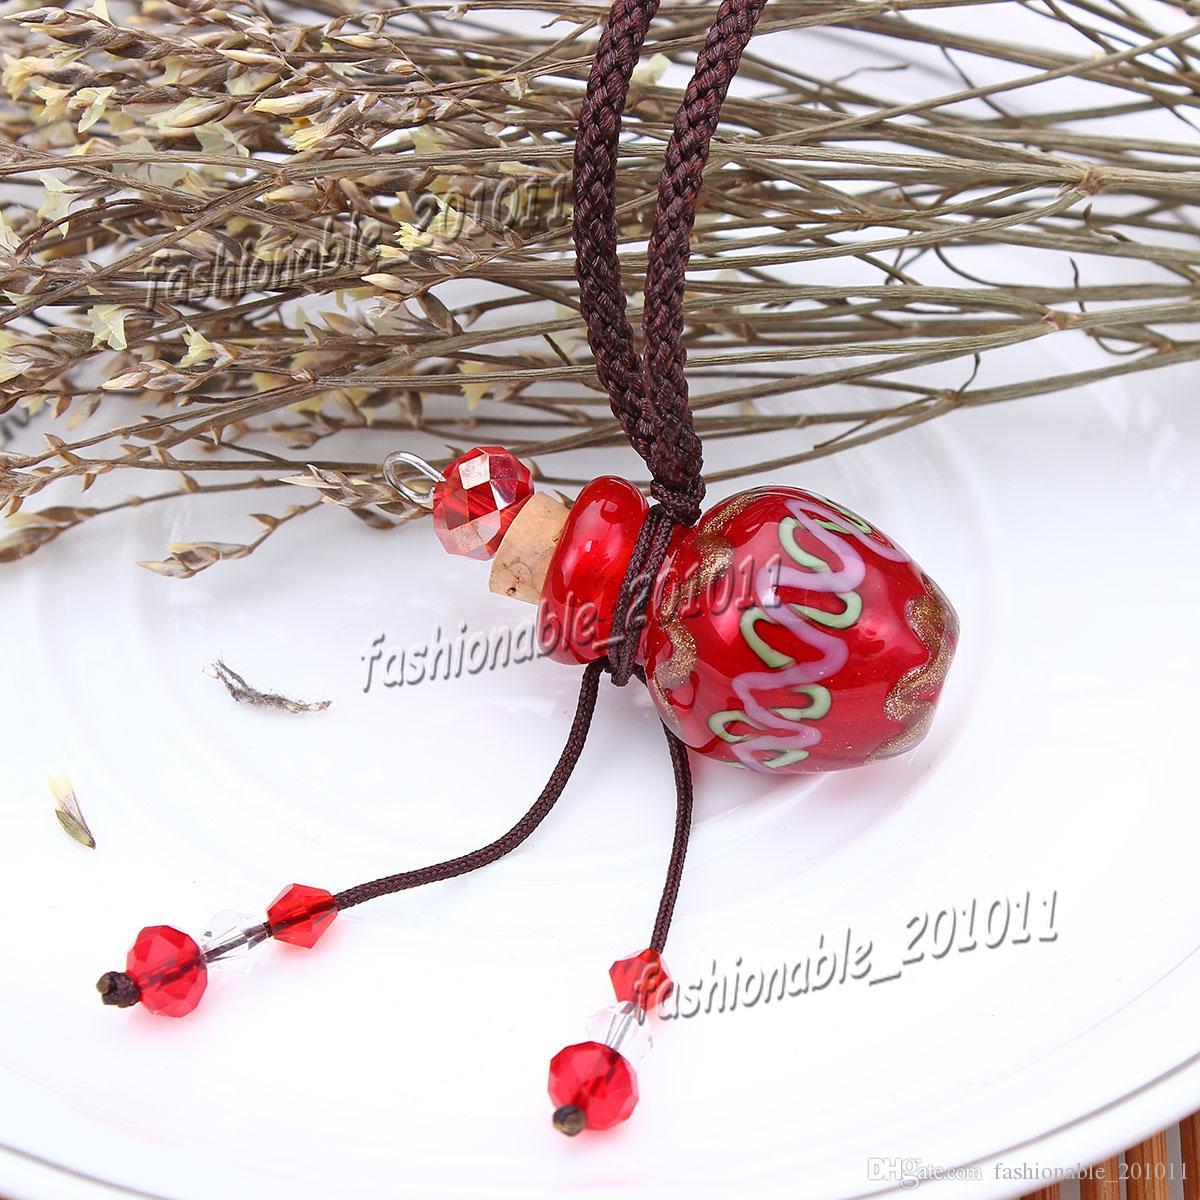 Vidrio difusor de aceites esenciales collares flores vial collar colgante de aromaterapia colgante botella perfume vintage colgante collar ob17